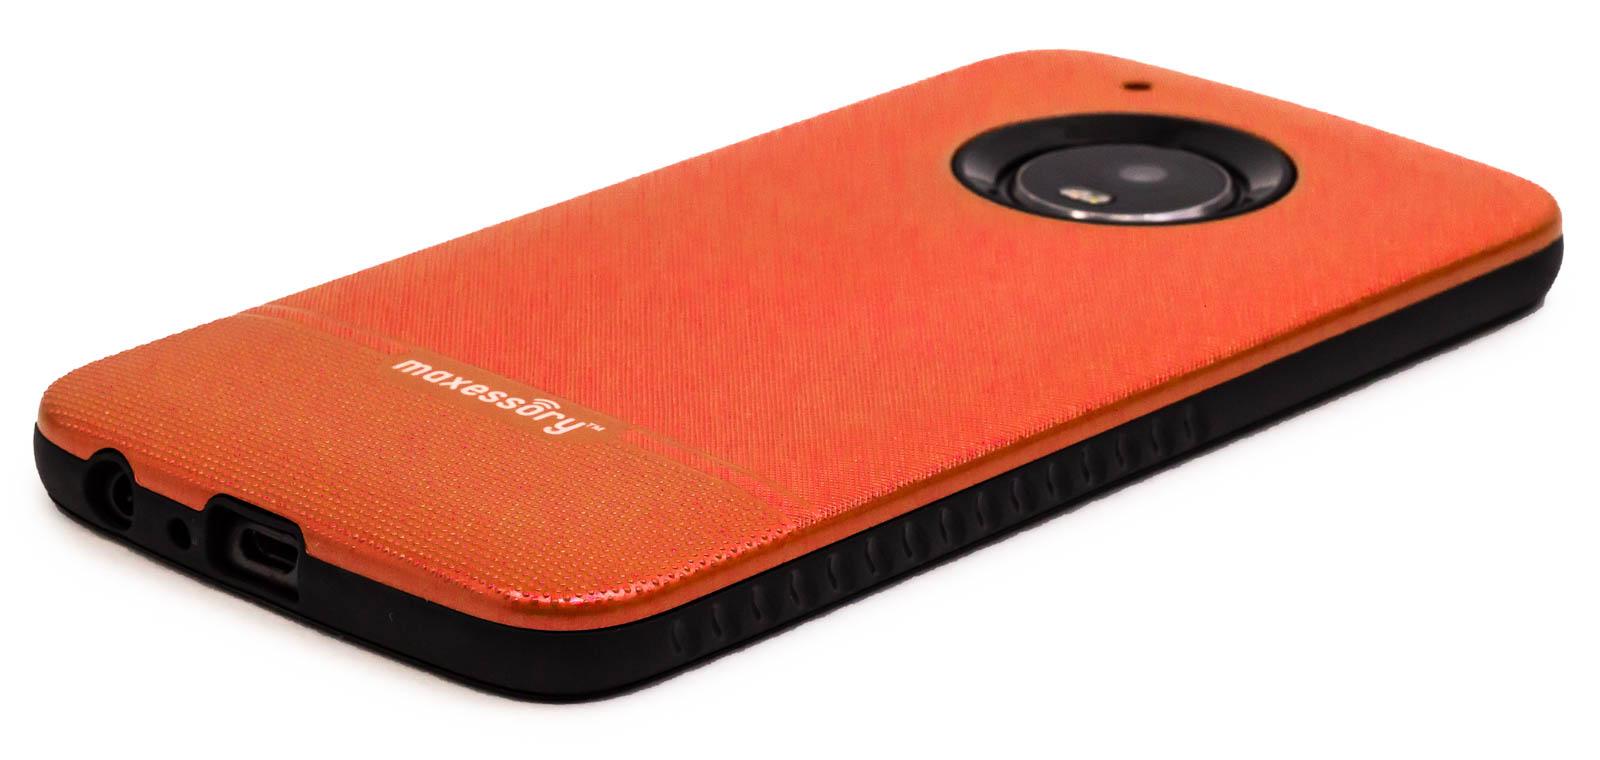 Moto-G5-Plus-Case-Moto-X-17-Case-Ultra-Thin-Hard-Body-Tactile-Shell-Cover thumbnail 25